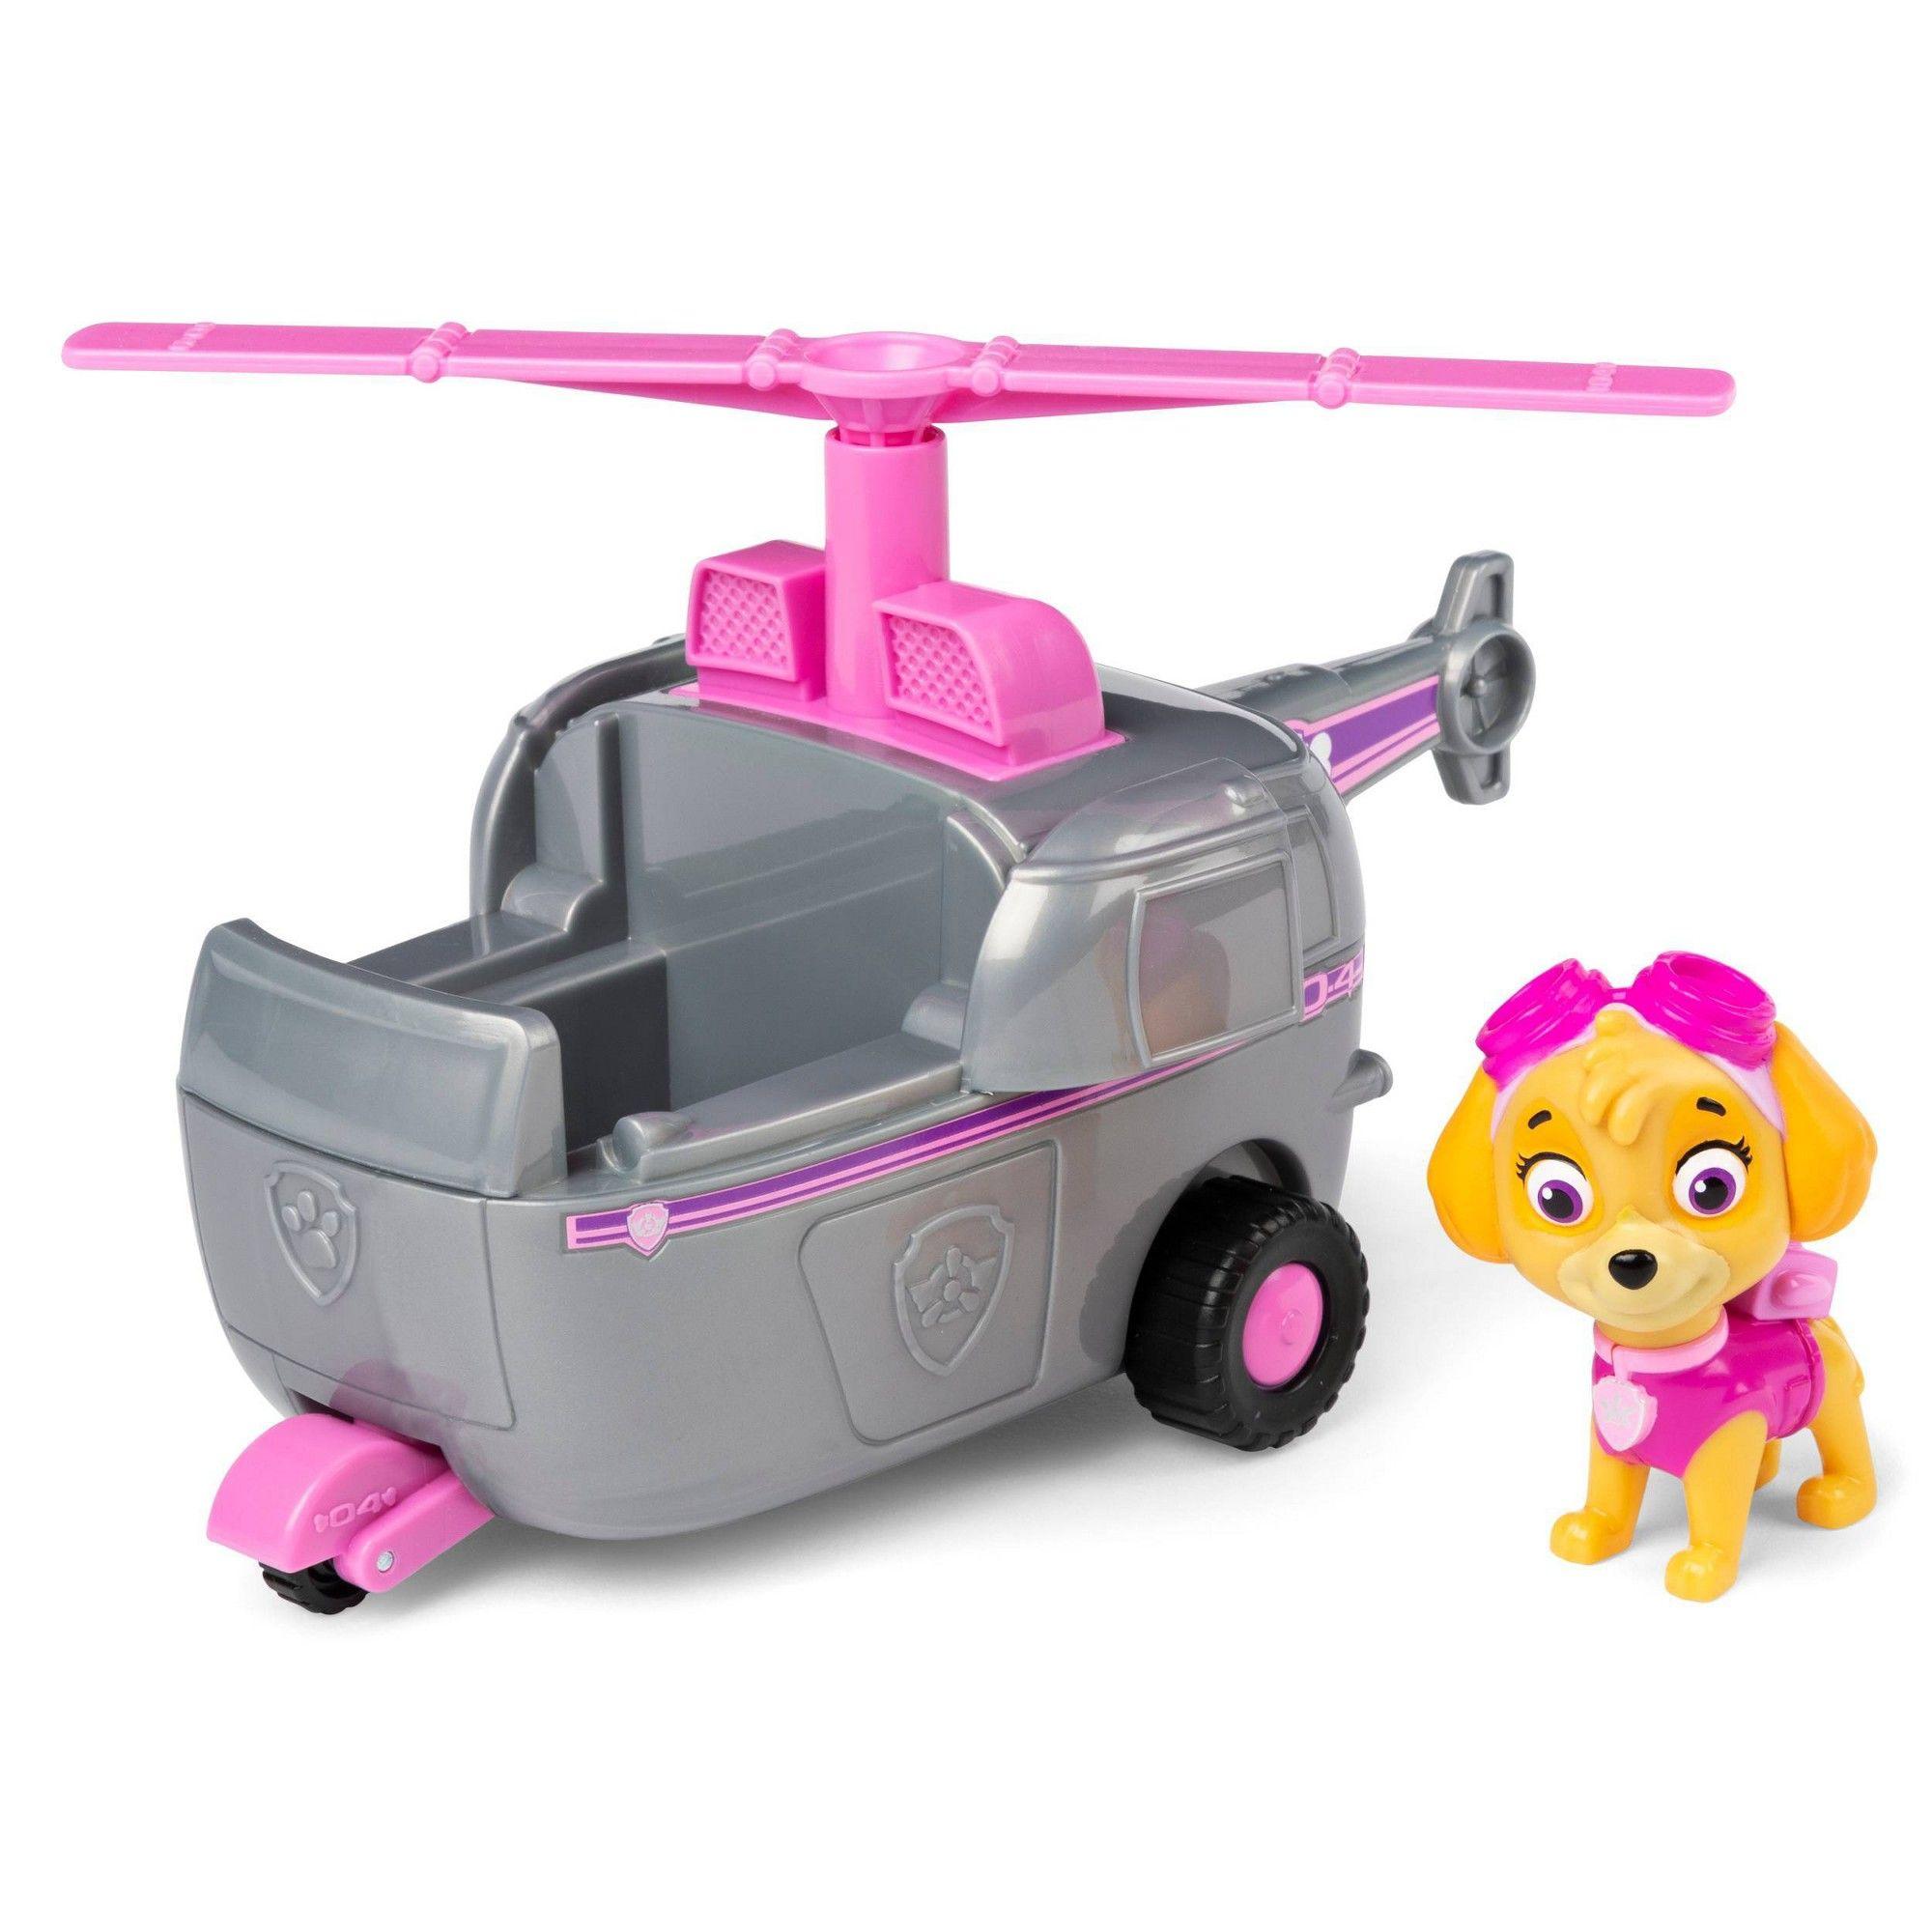 Paw Patrol Helicopter Vehicle Skye Paw Patrol Toys Paw Patrol